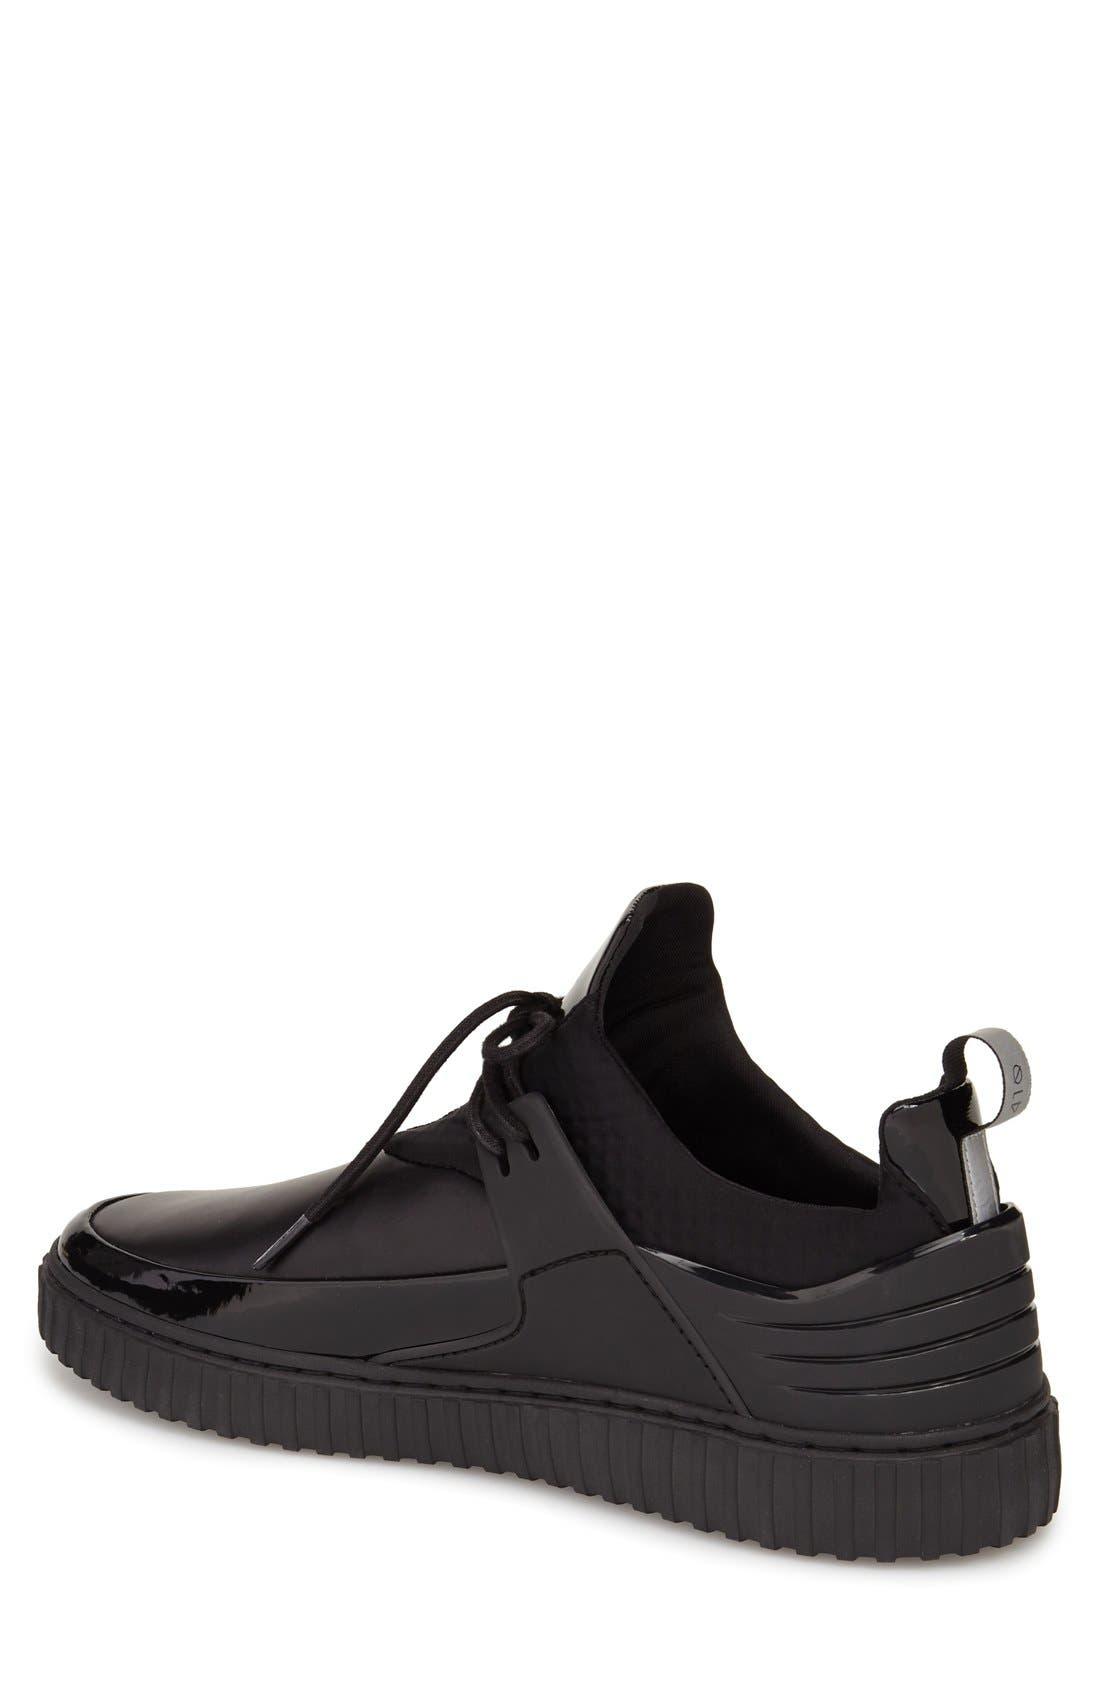 x Nick Jonas Castucci Sneaker,                             Alternate thumbnail 2, color,                             004